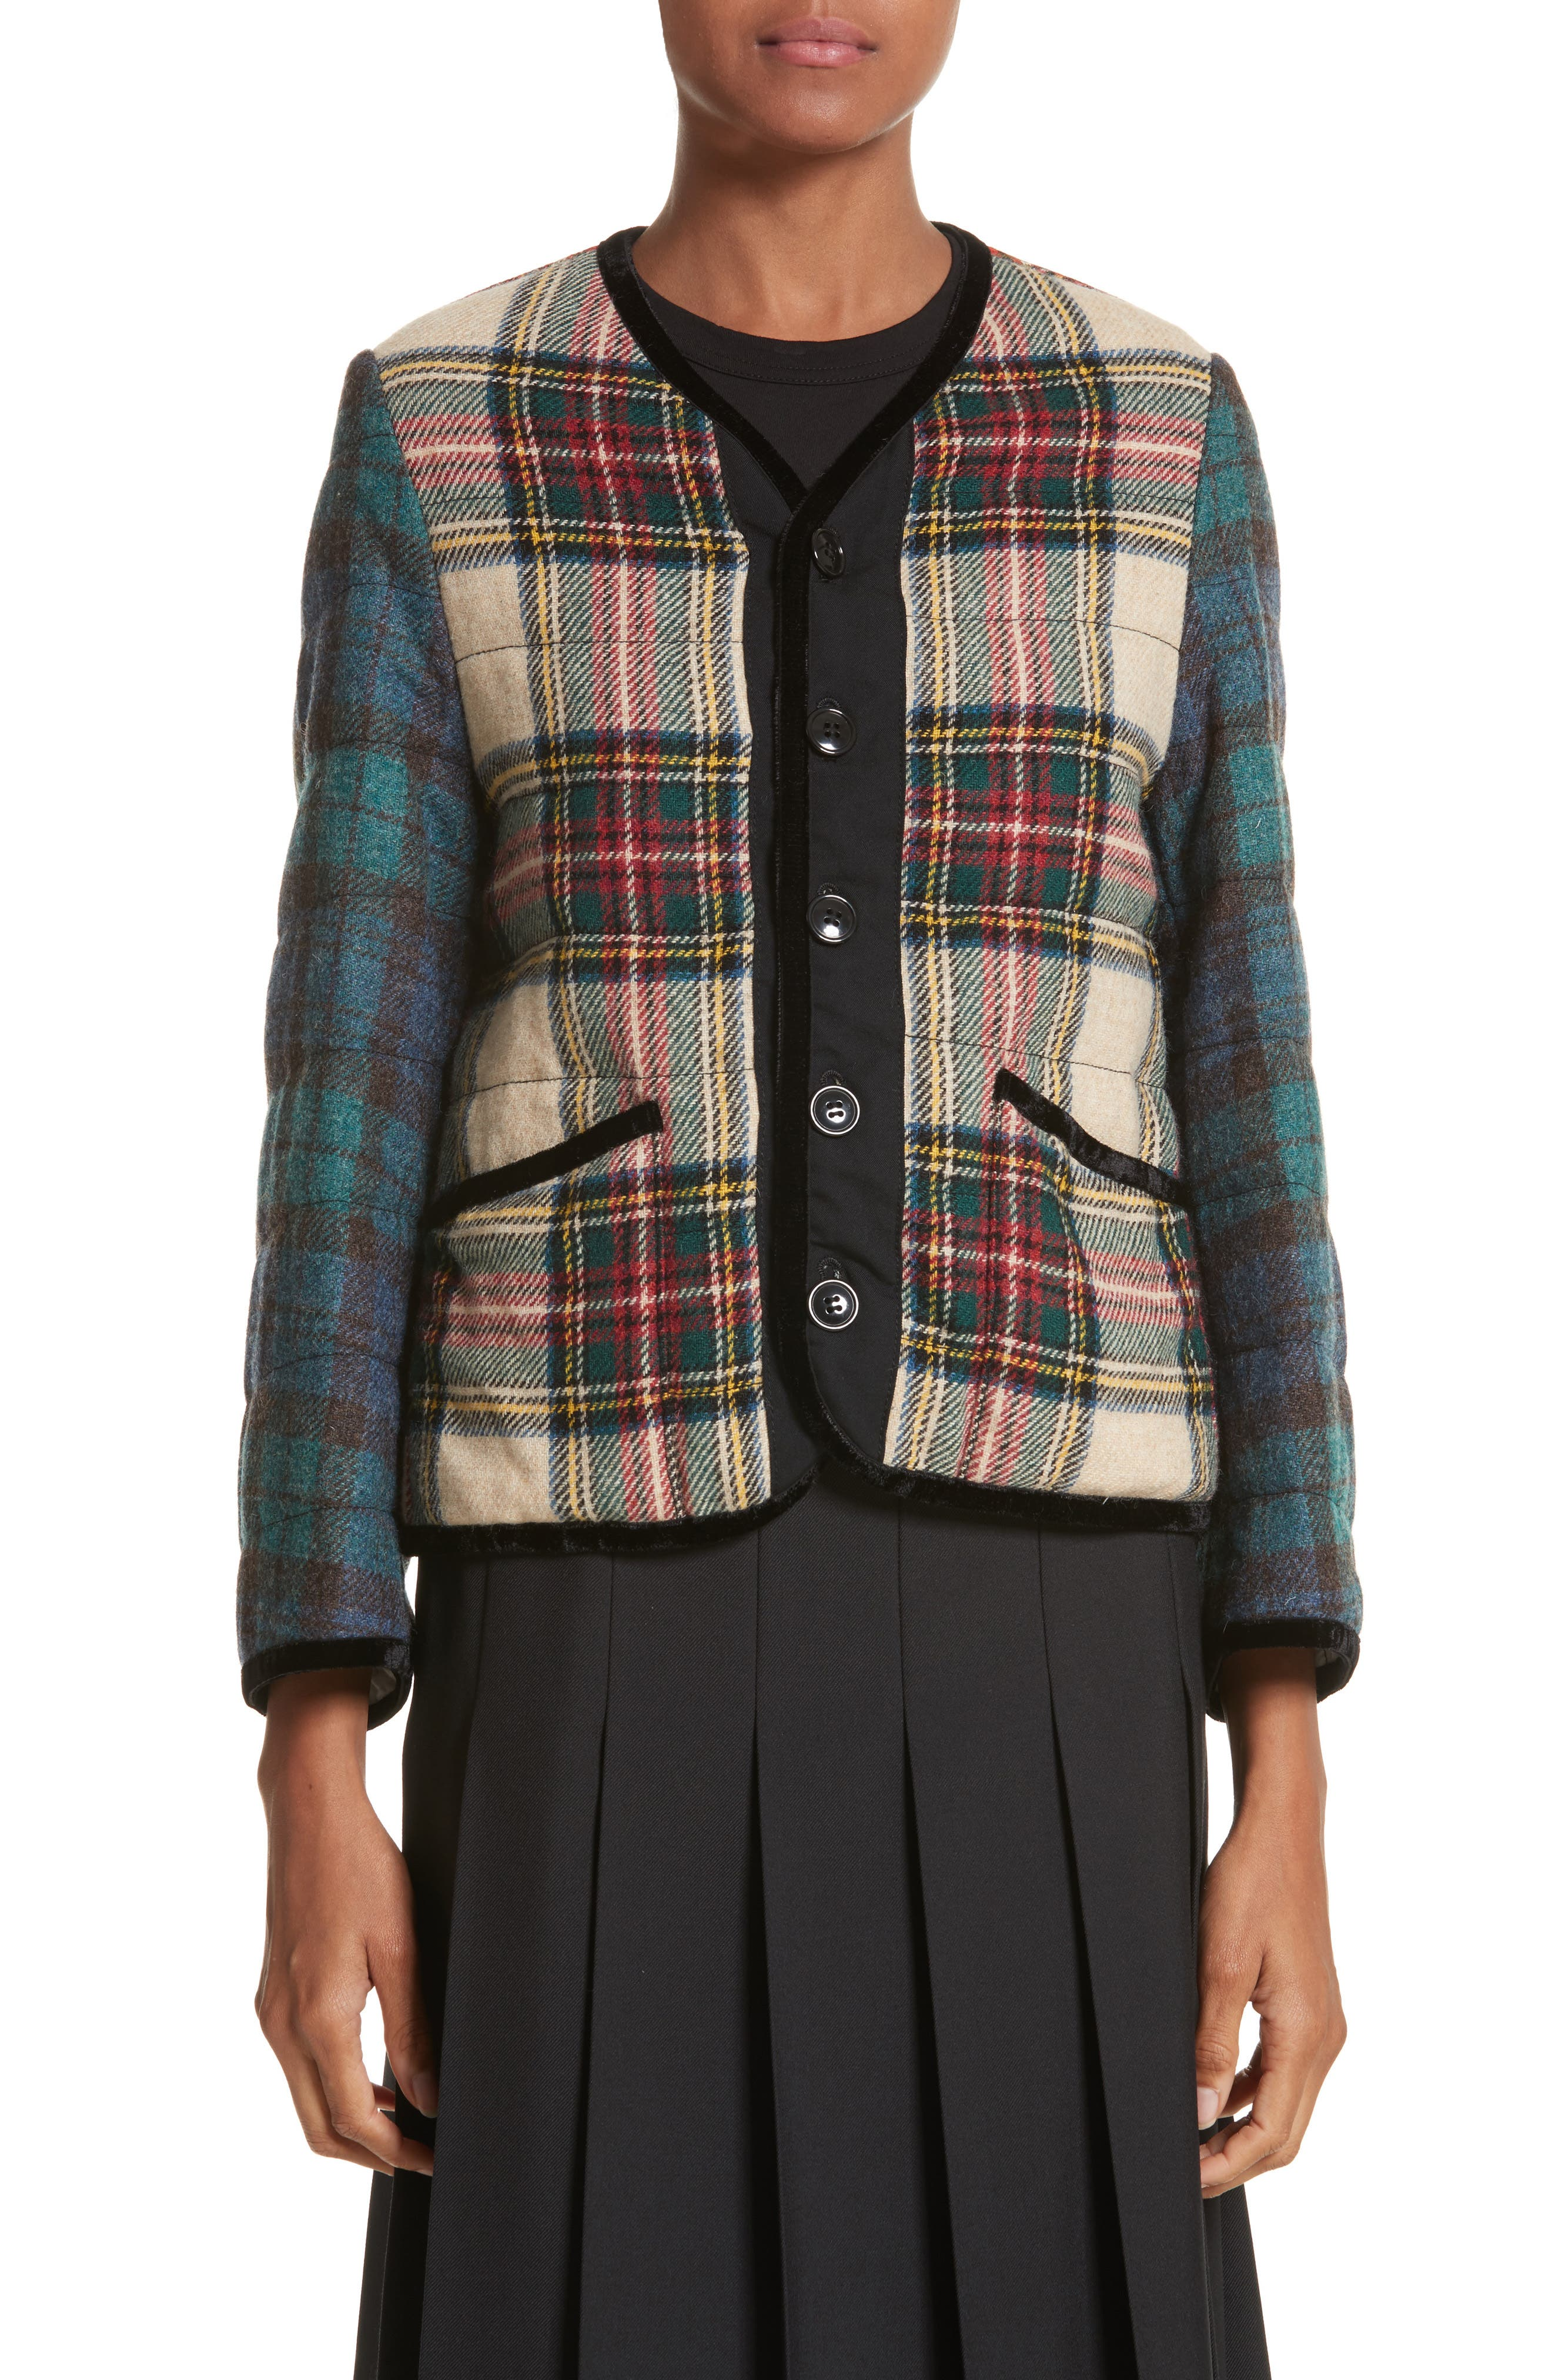 Main Image - Tricot Comme des Garçons Mixed Tartan Wool Jacket